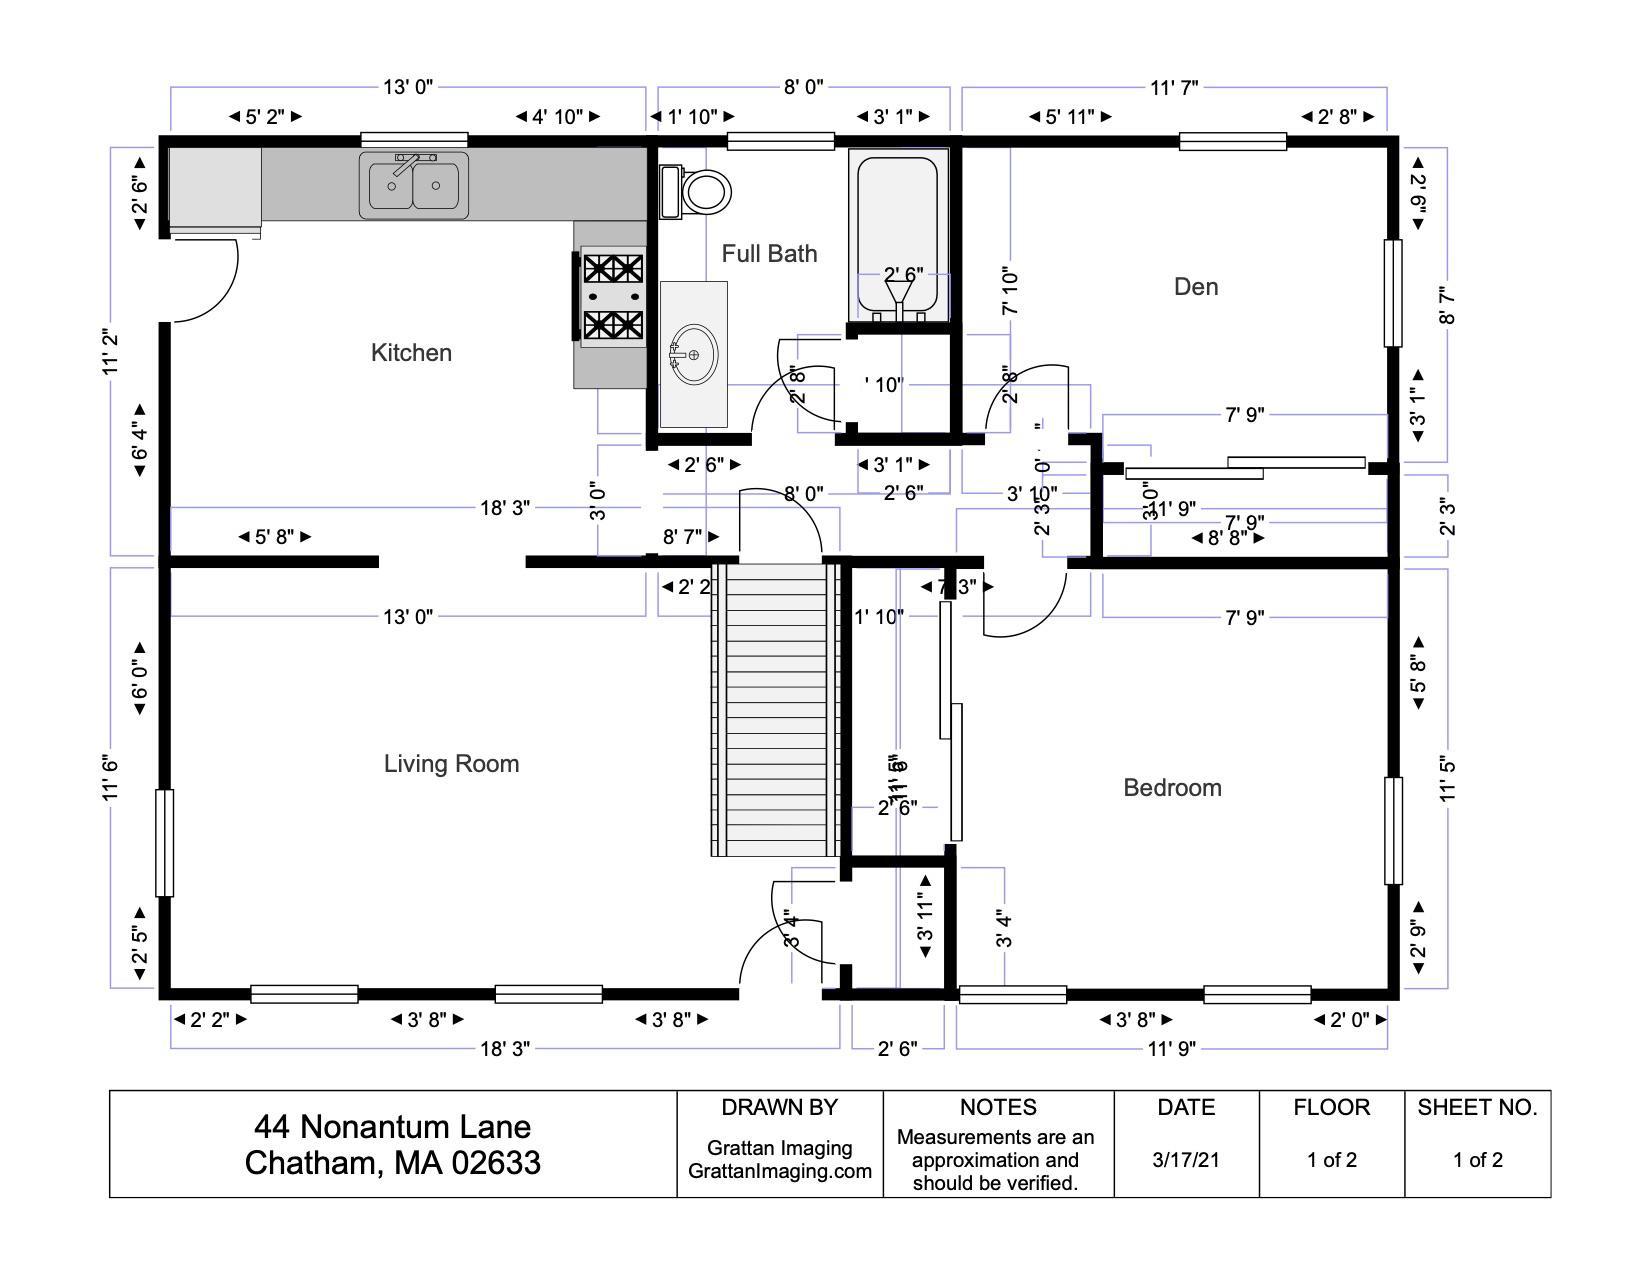 44 Nonantum Lane, Chatham MA, 02633 - slide 40